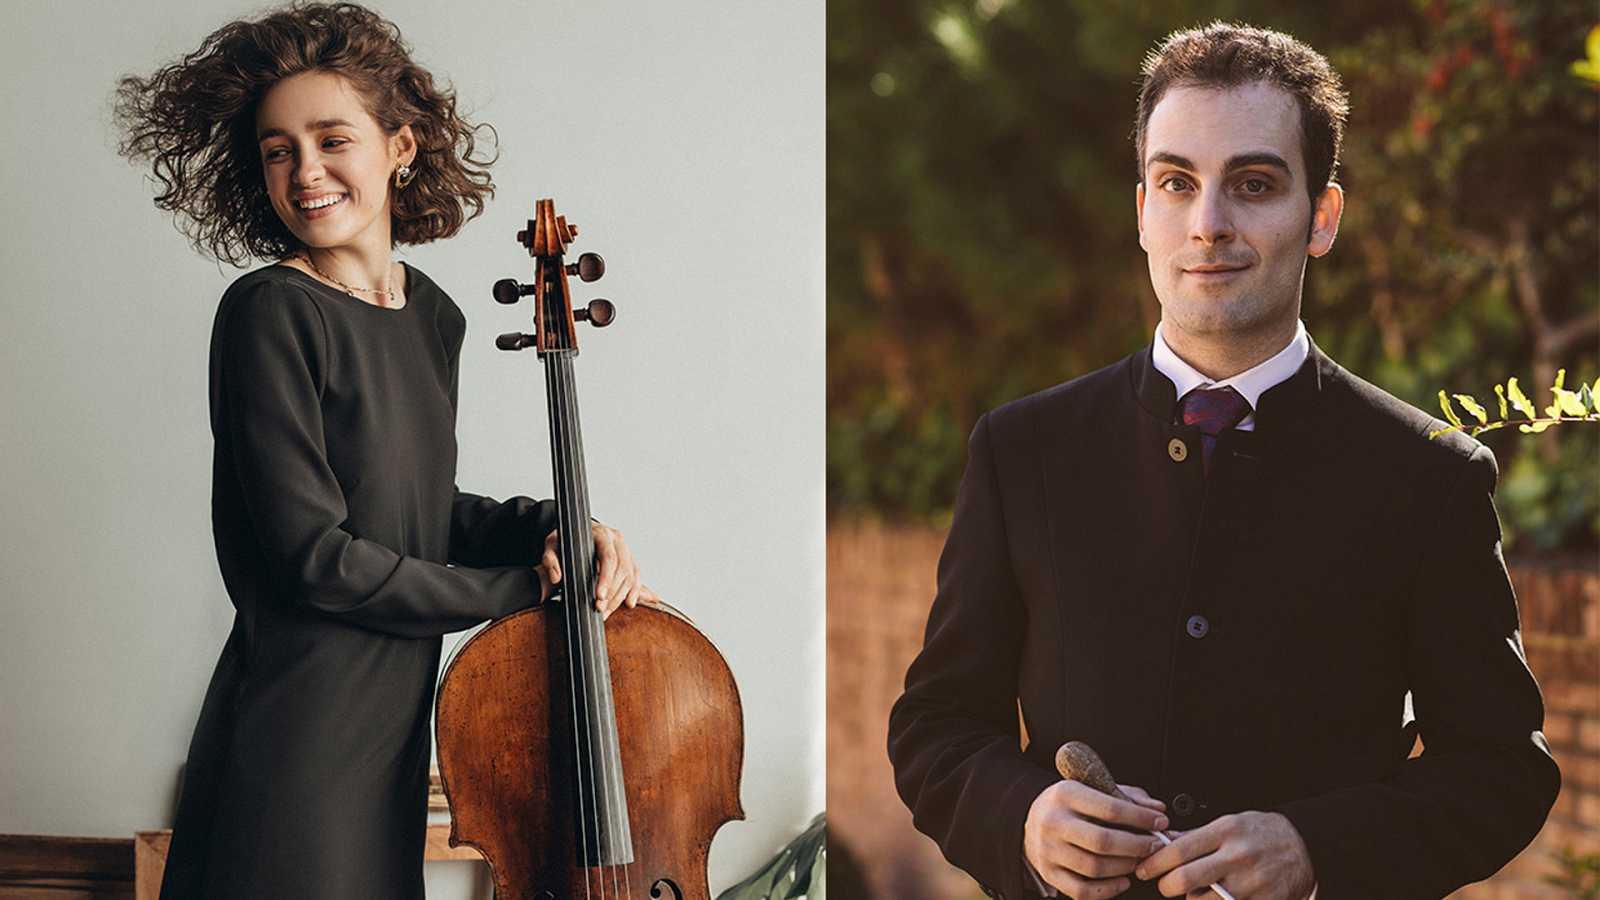 La violoncelista  Anastasia Kobekina y el maestro Edmon Levon